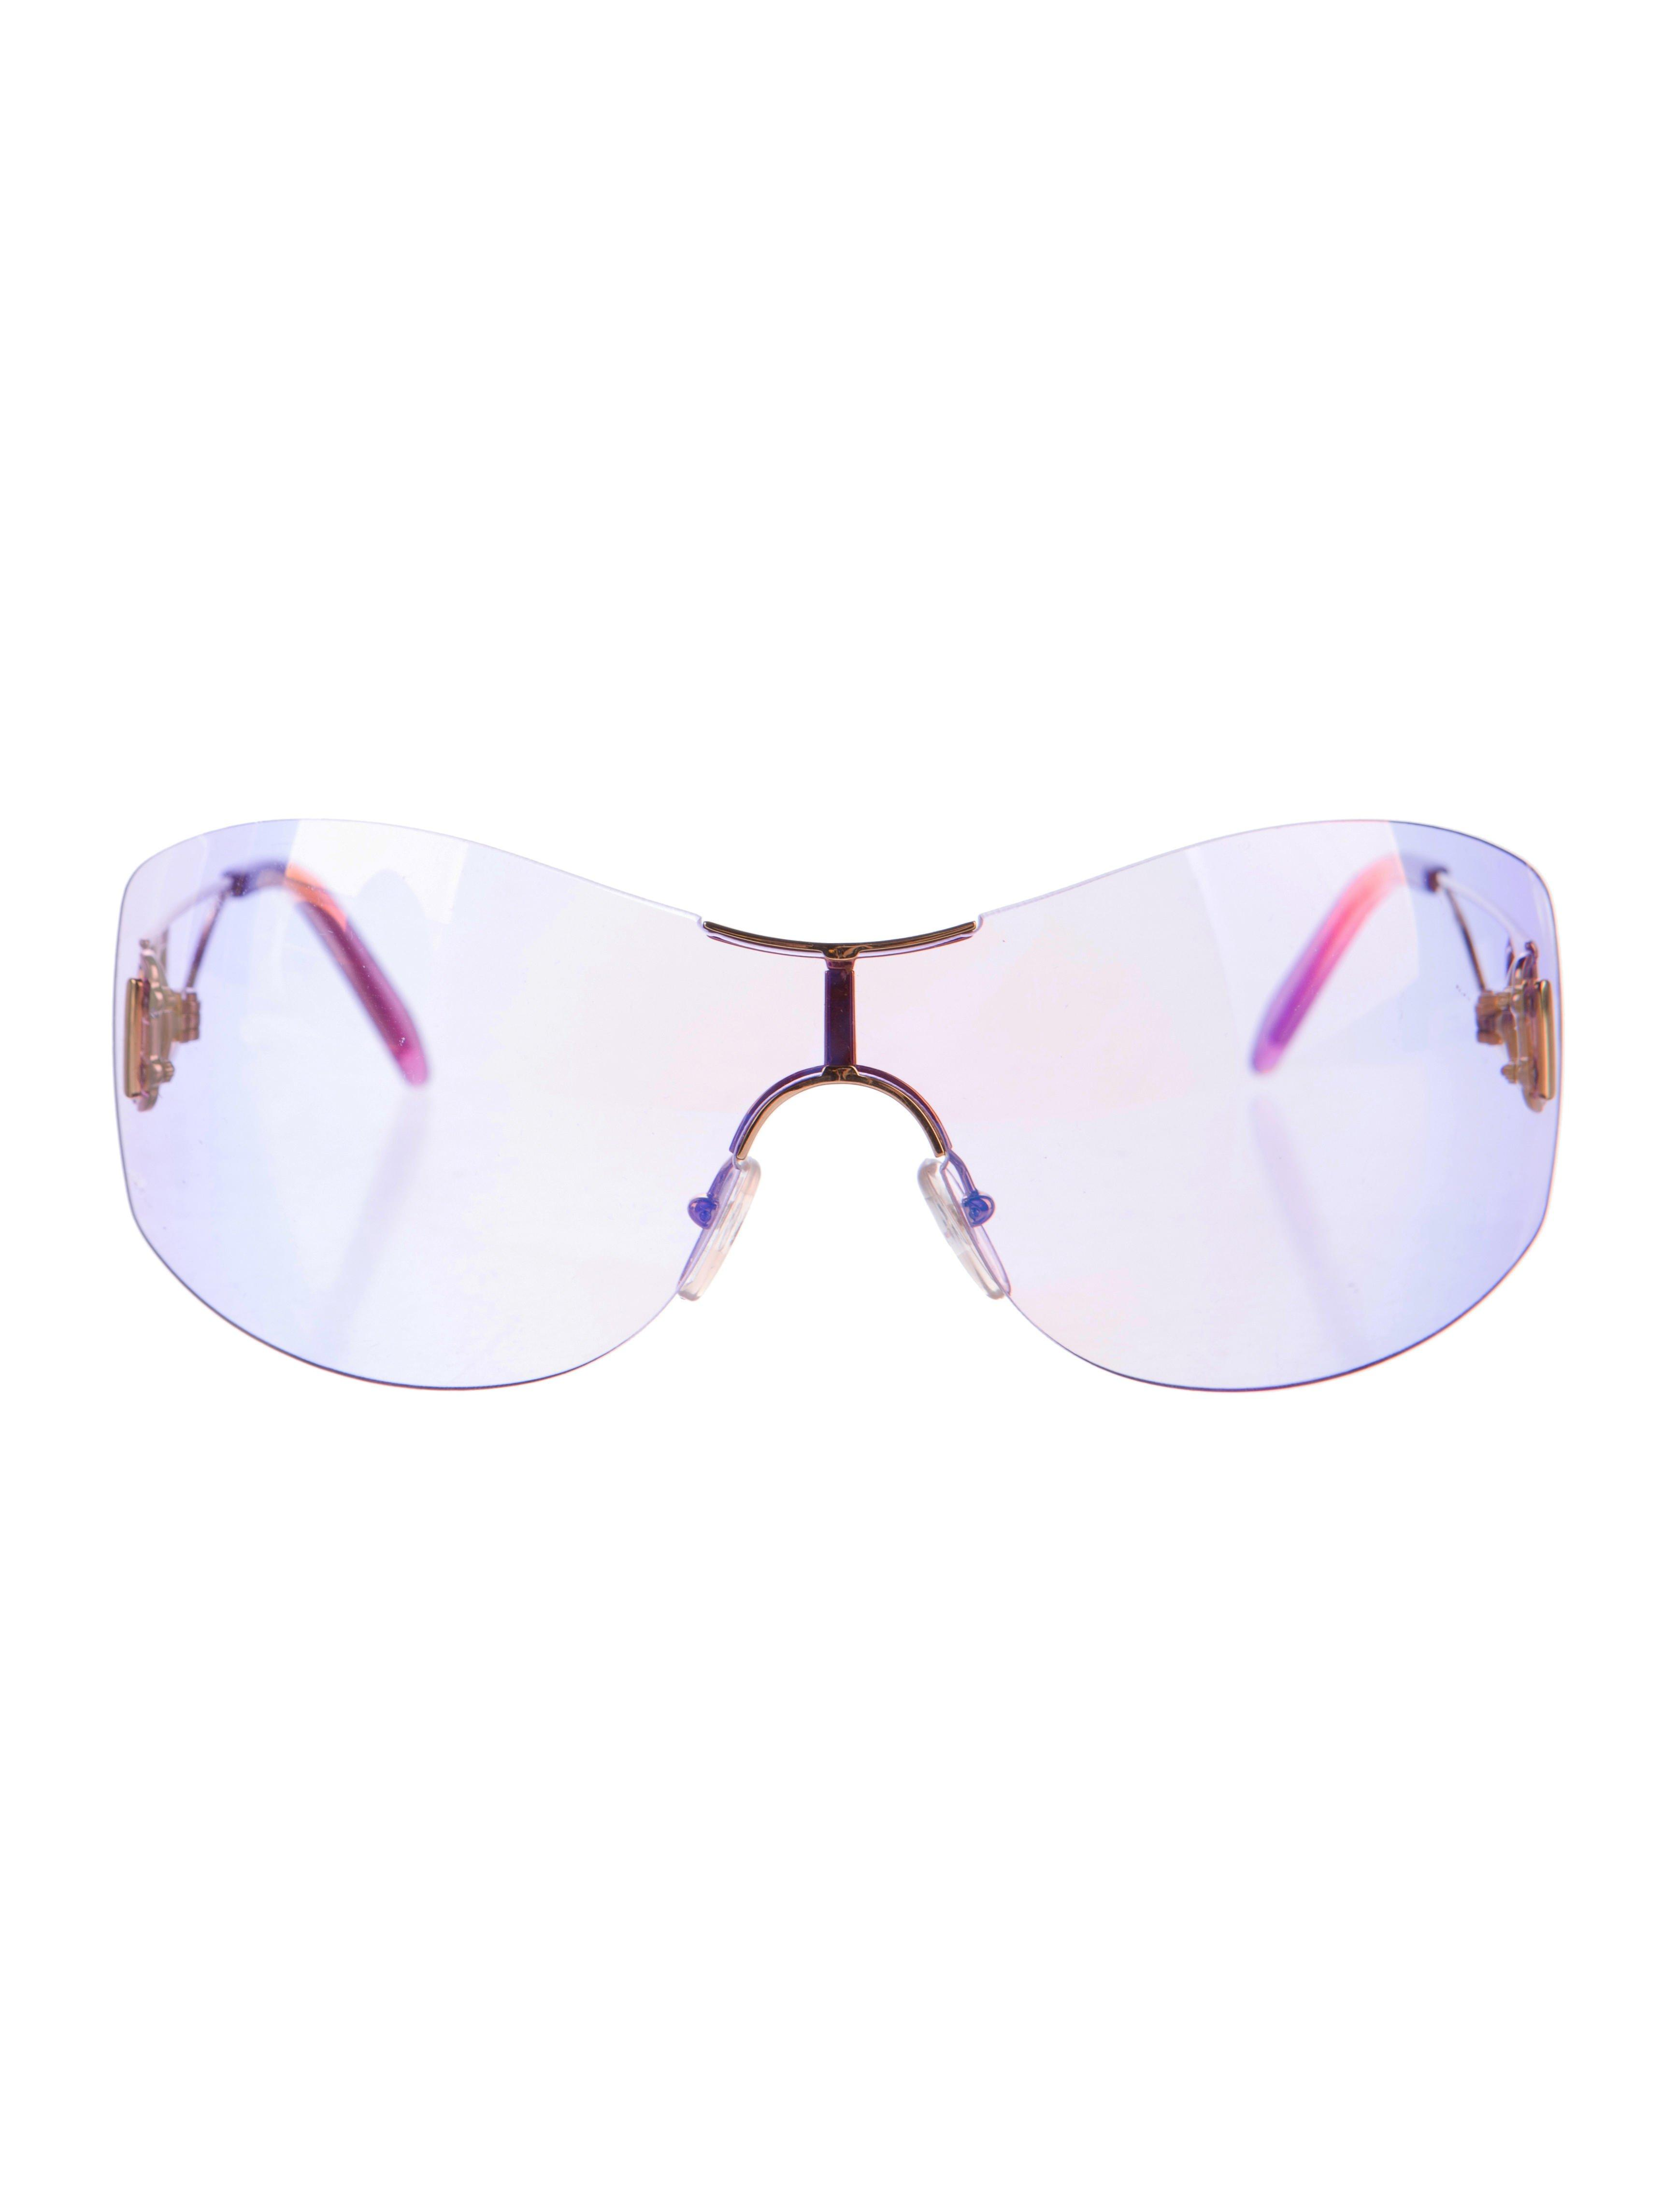 8aac12f6986 Lyst - Dior Diorella Shield Sunglasses Gold in Metallic